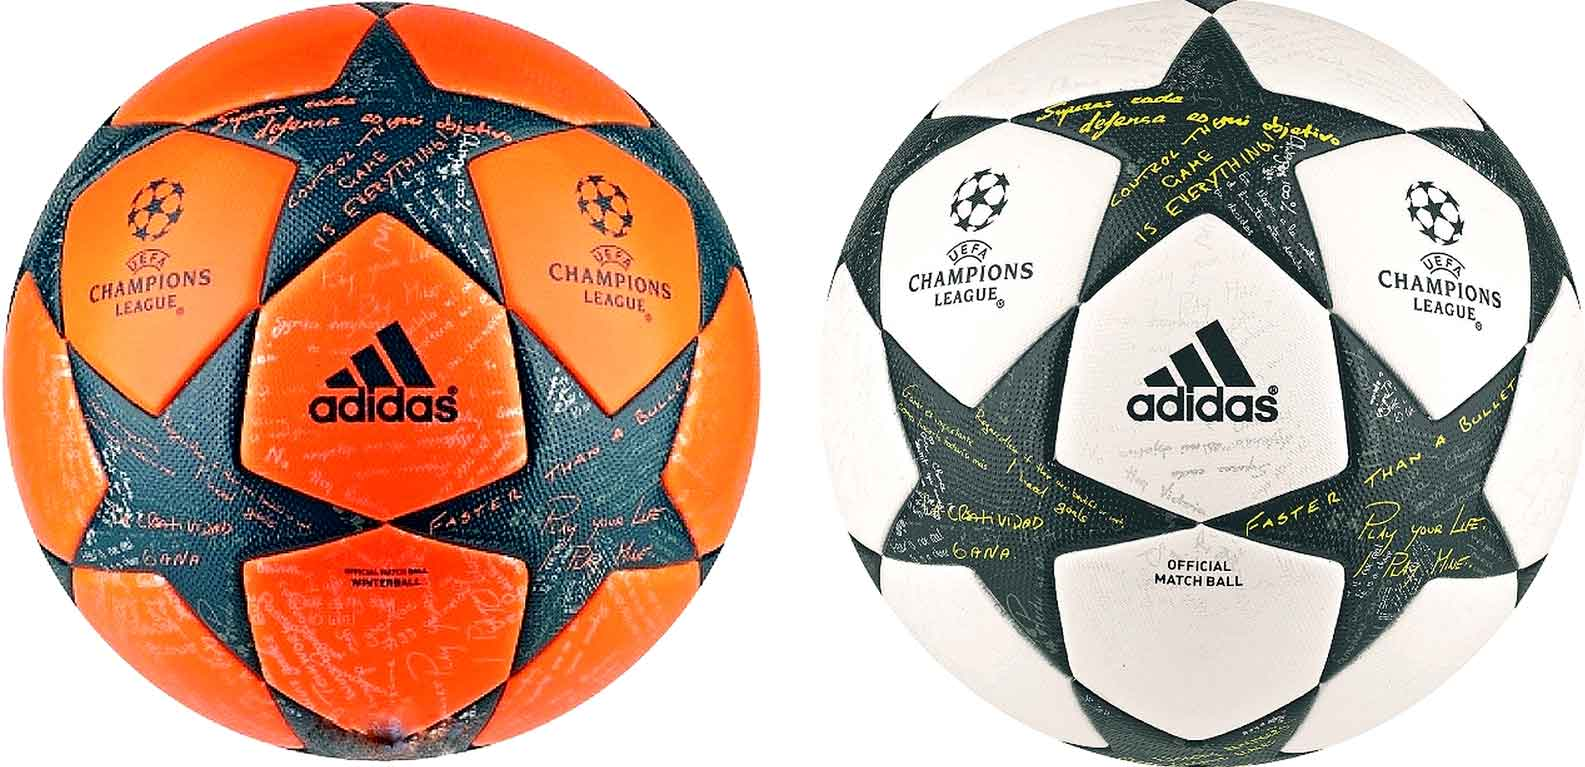 мяч лиги чемпионов 16-17 adidas fianle 16 winterball